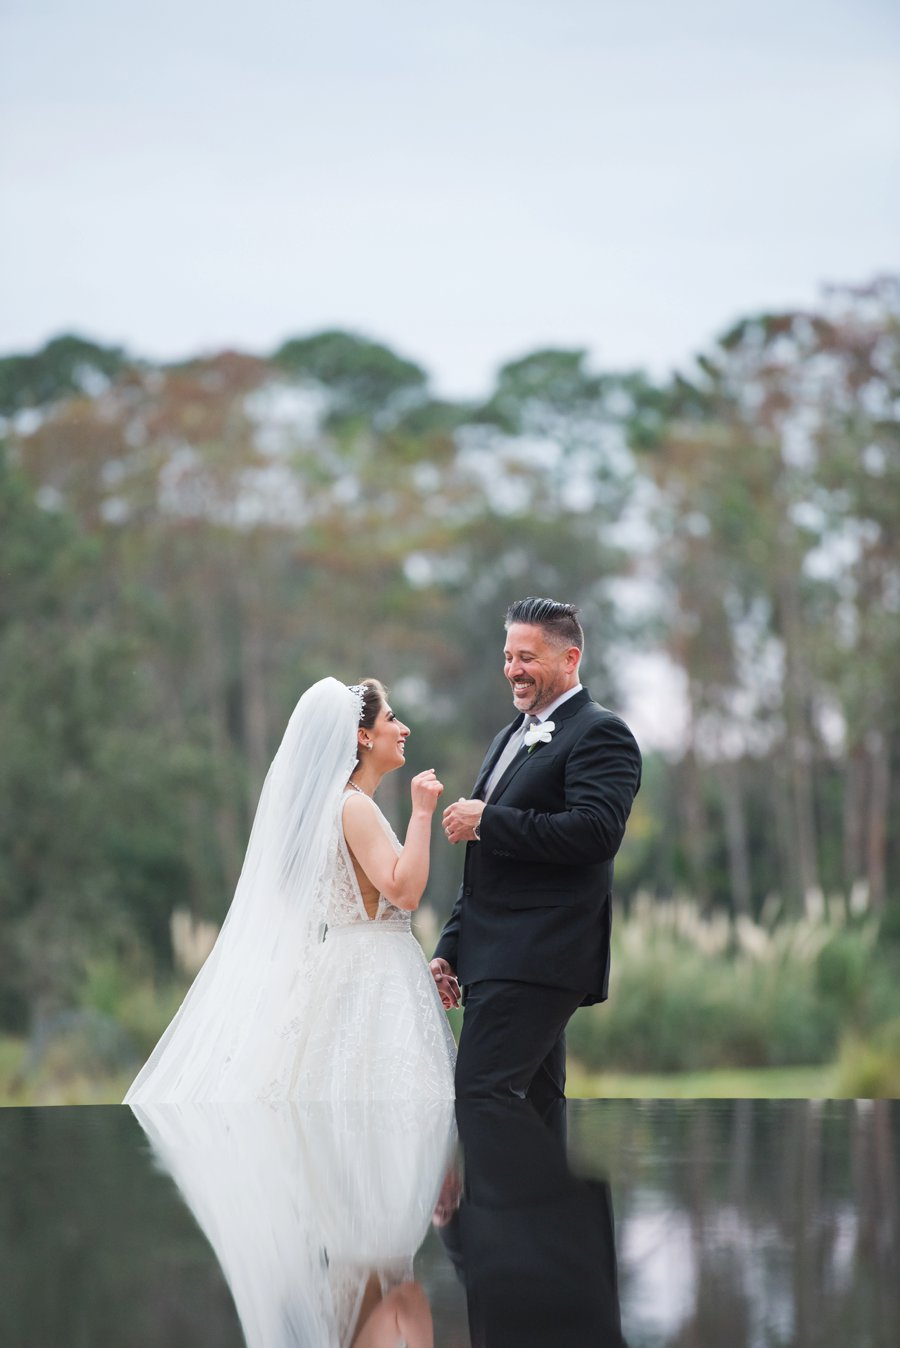 A Elegant Silver & White Black Tie Wedding via TheELD.com